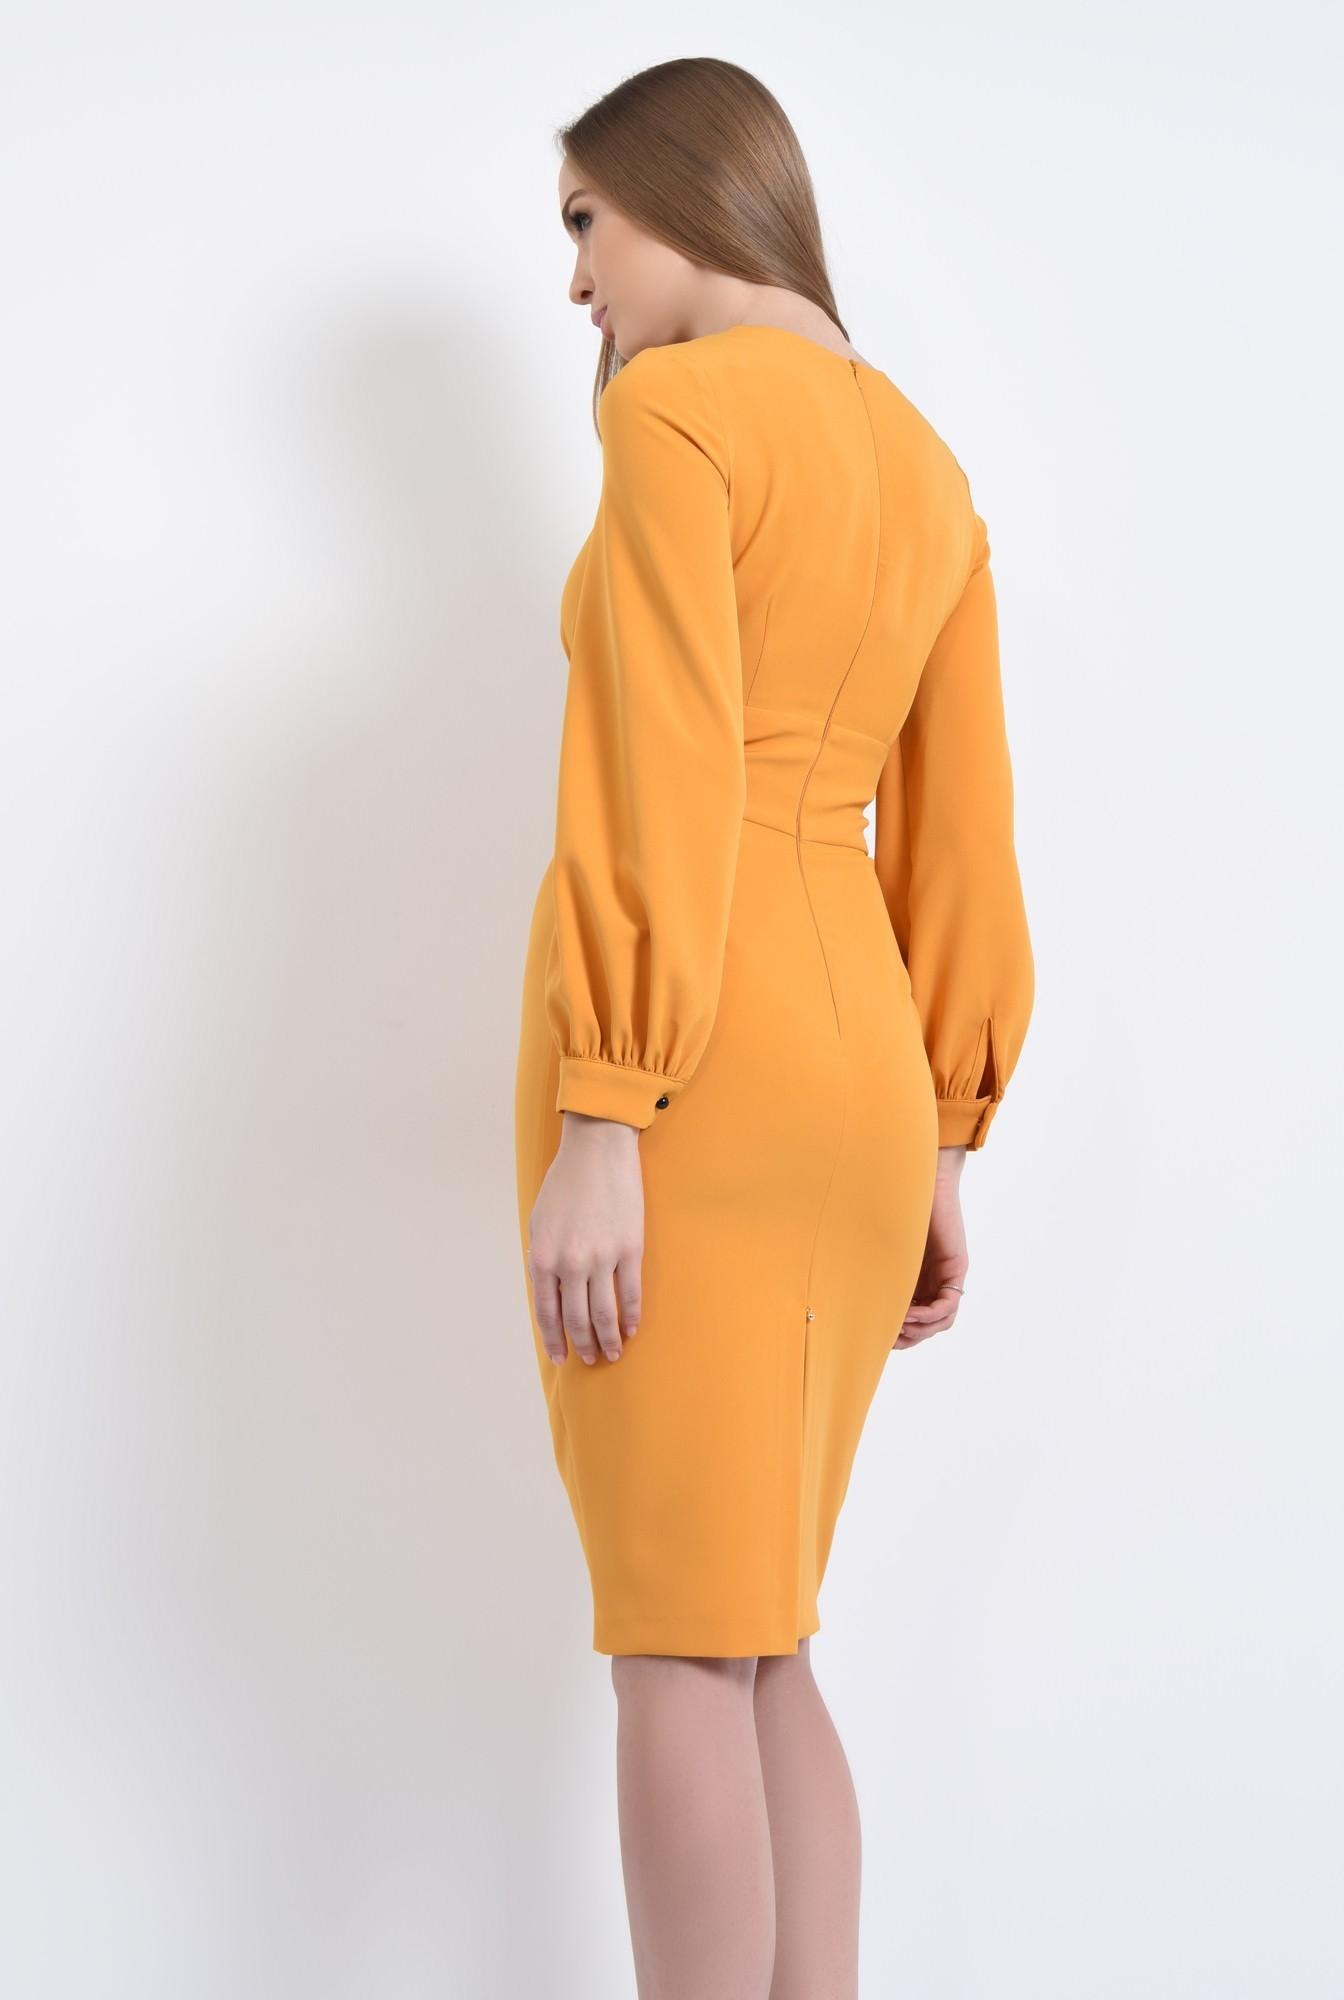 1 - 360 - rochie conica, maneci bufante, mansete, rochii online, funda, nasturi, contrast